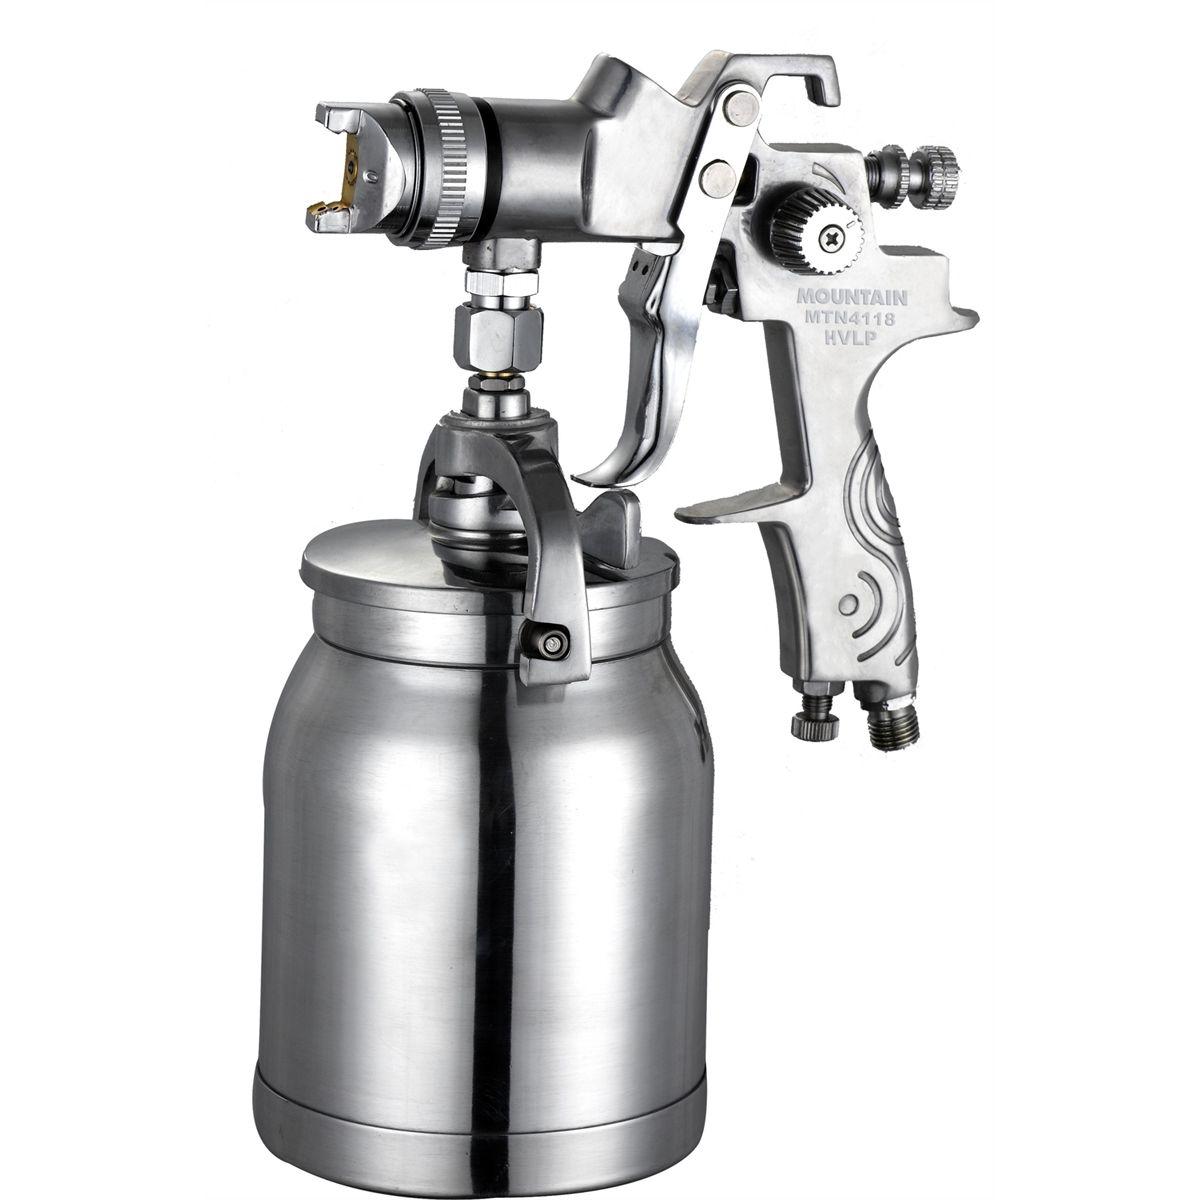 Mountain 1 8 hvlp syphon feed spray gun csg319 isn for Spray gun for oil based paints